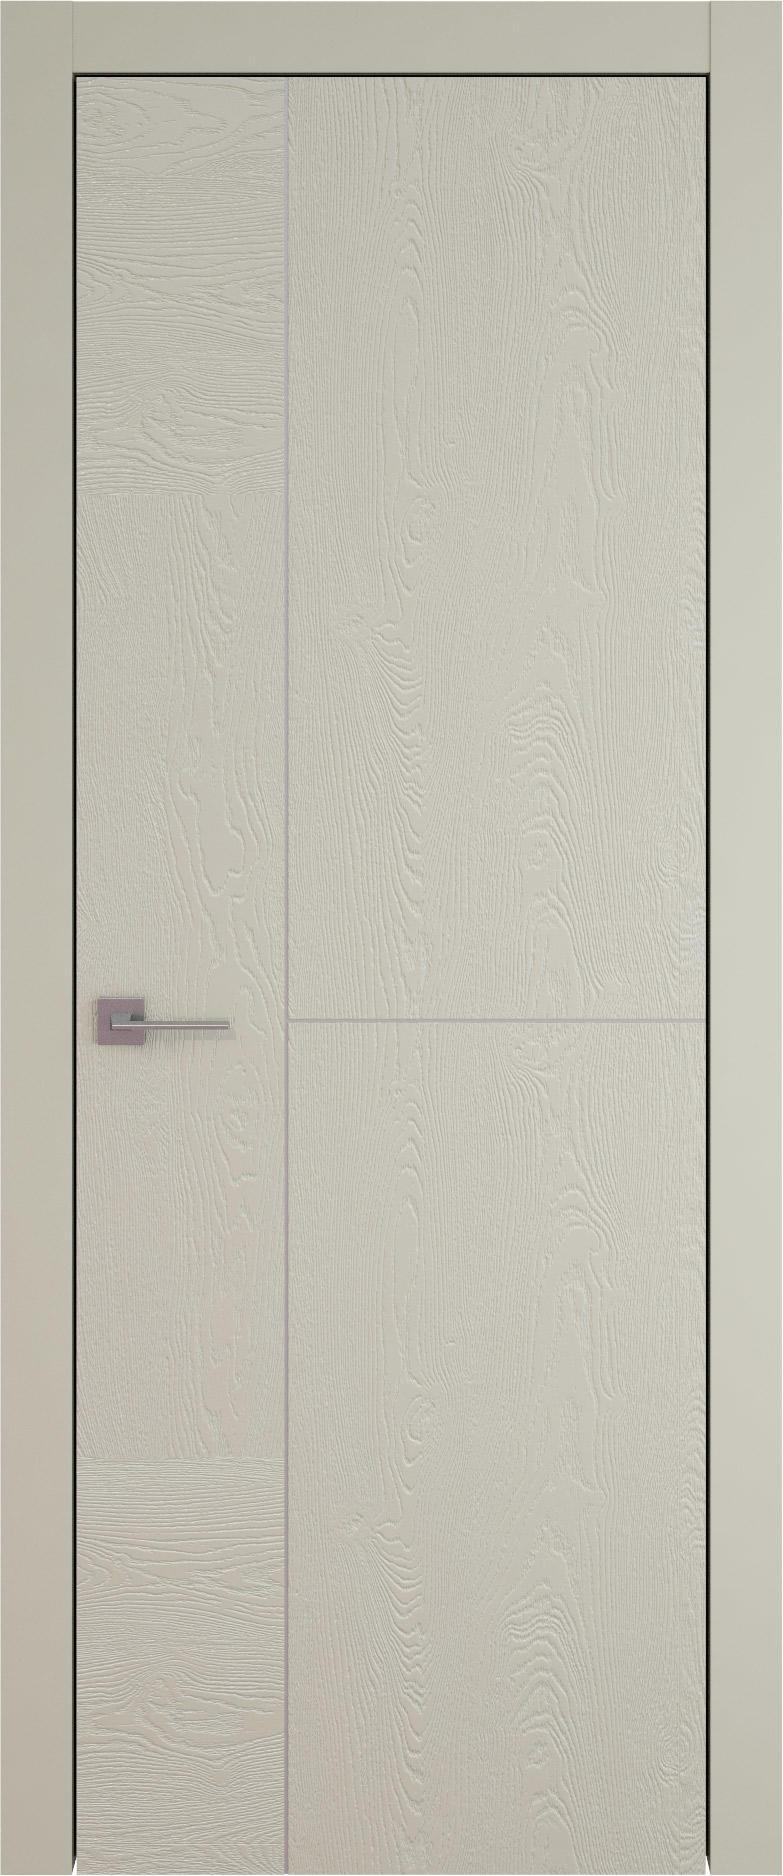 Tivoli Г-1 цвет - Серо-оливковая эмаль по шпону (RAL 7032) Без стекла (ДГ)